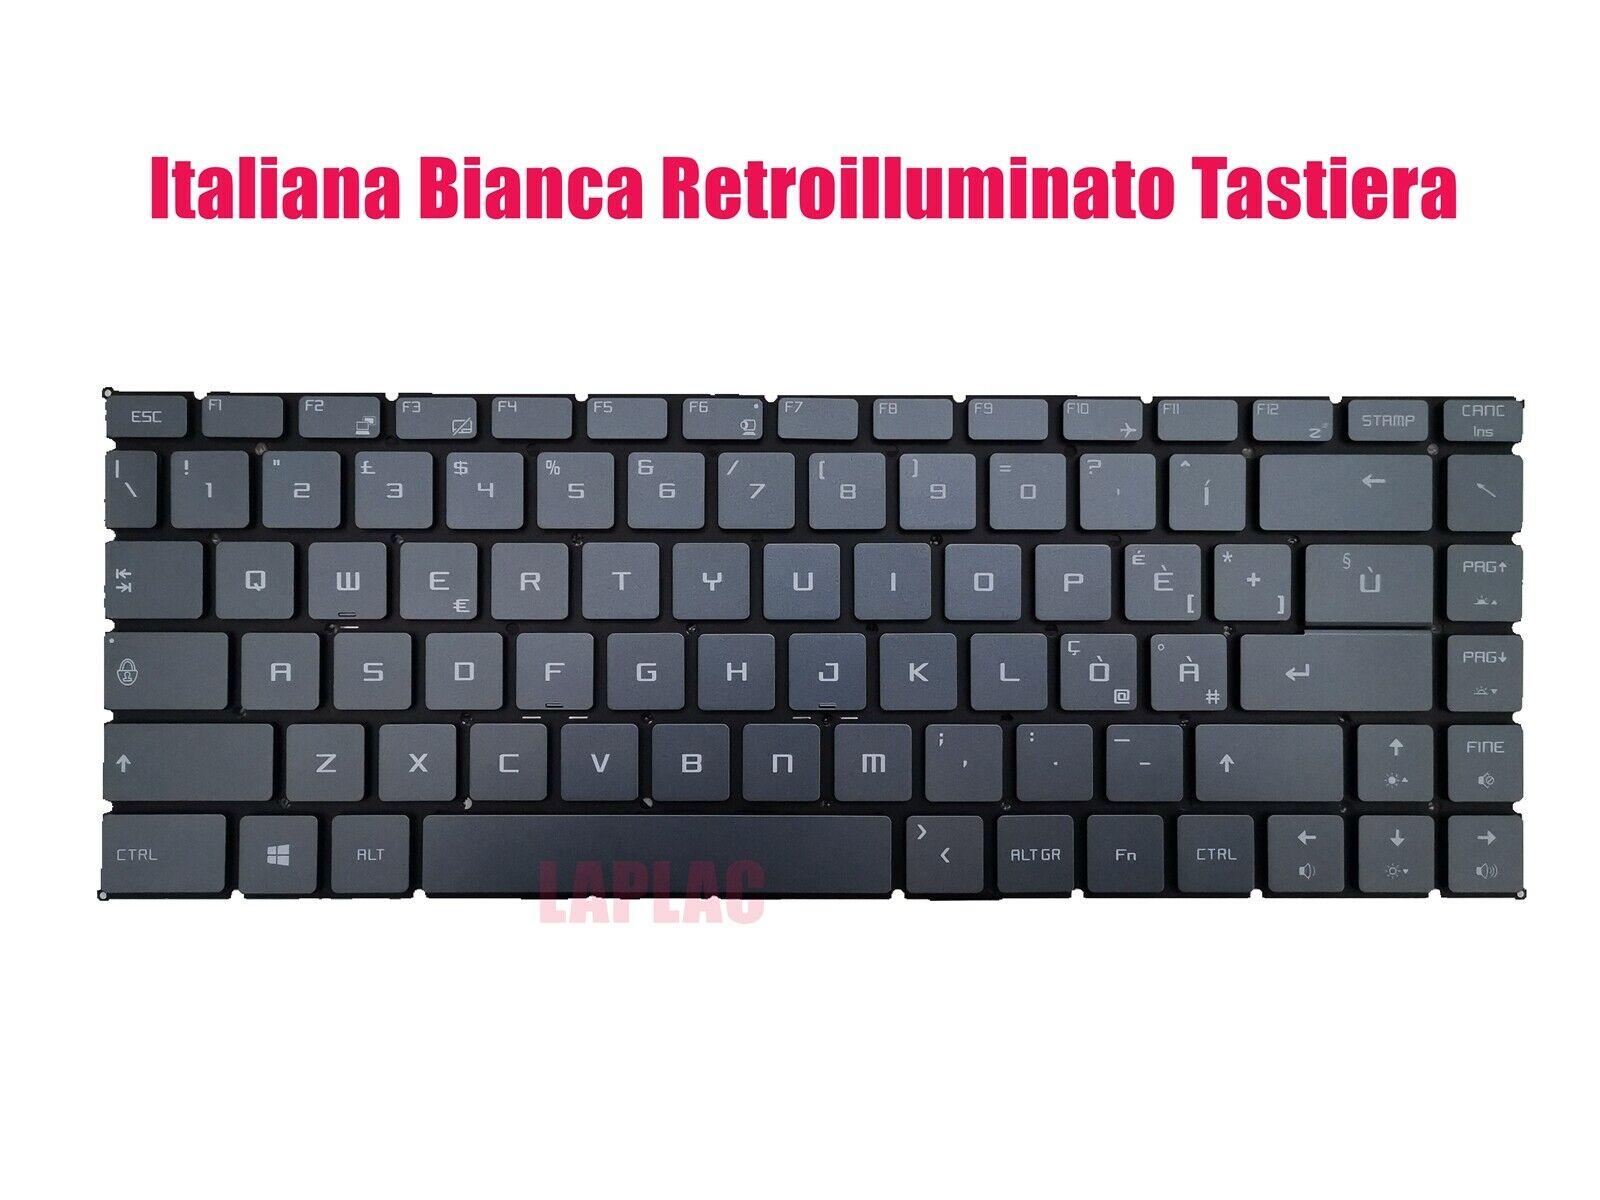 Italiana branca retroiluminado tastiera per msi moderno 14 a10m/a10rb (MS-14B3)